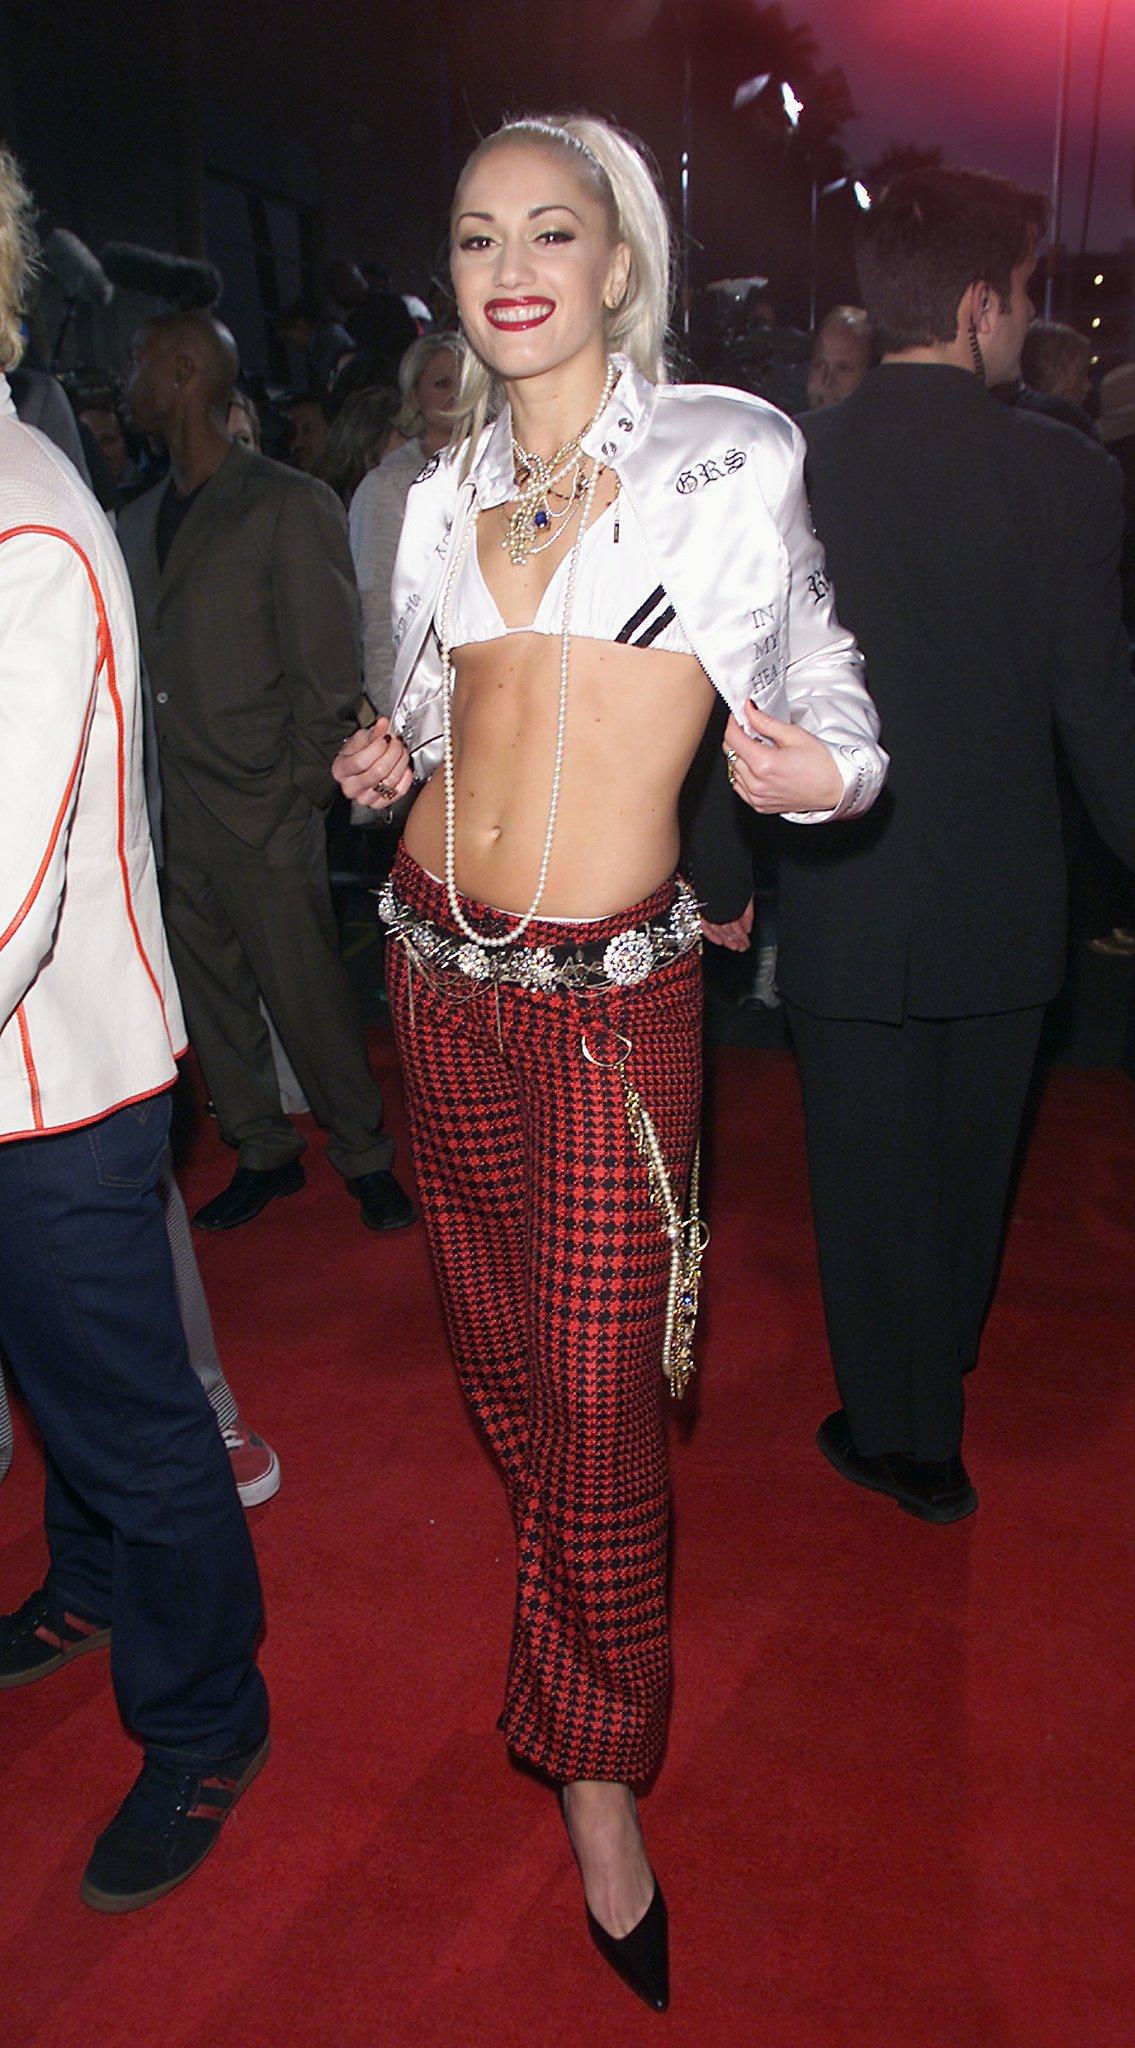 ... the Crop: Gwen Stefani's Ultimate Ab-Baring Looks | POPSUGAR Fashion Gwen Stefani